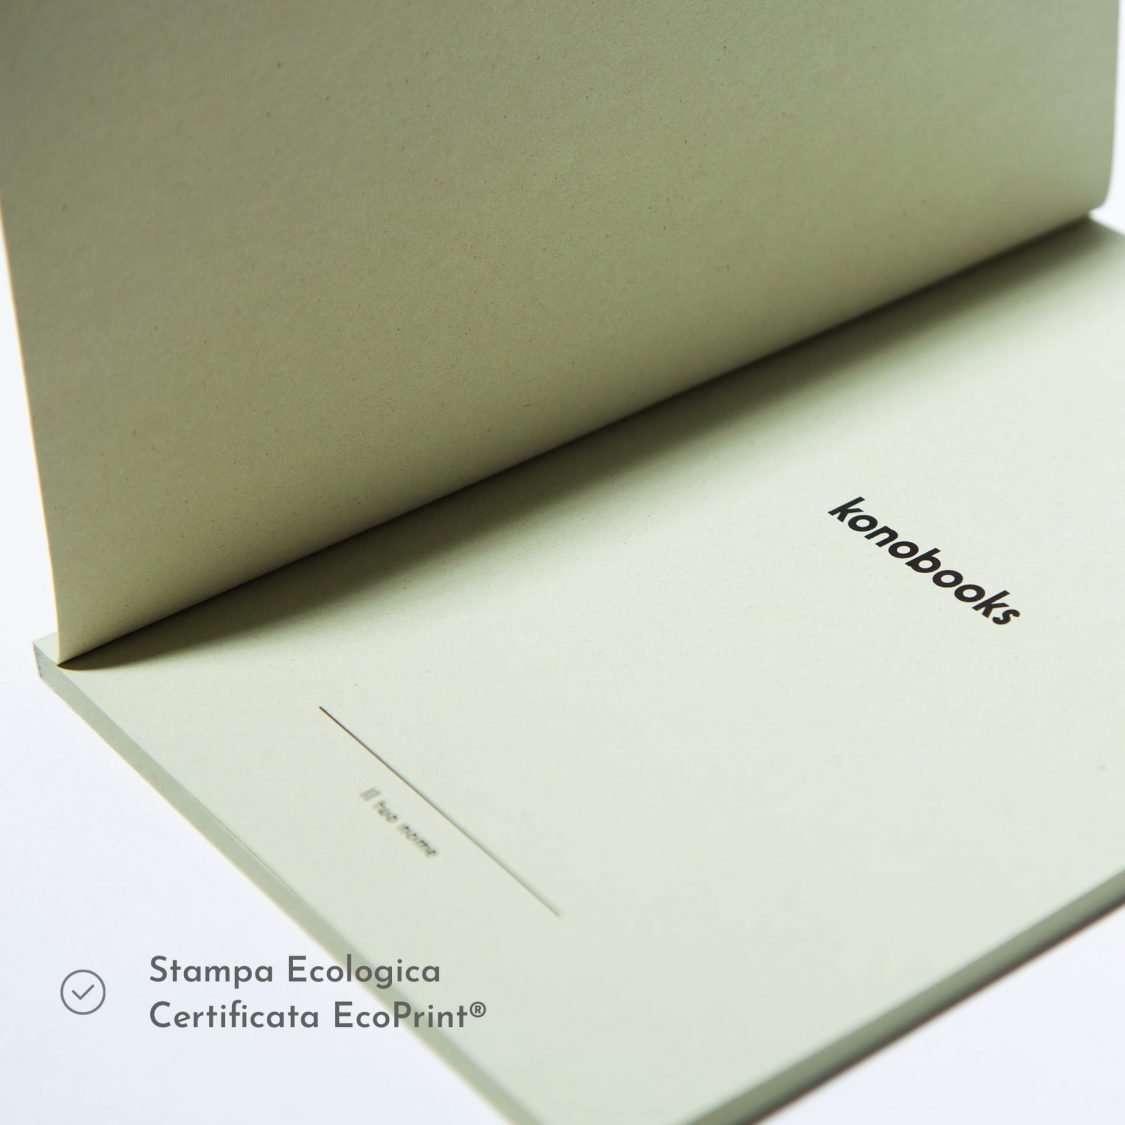 Quaderno con stampa ecologica EcoPrint - Konobooks